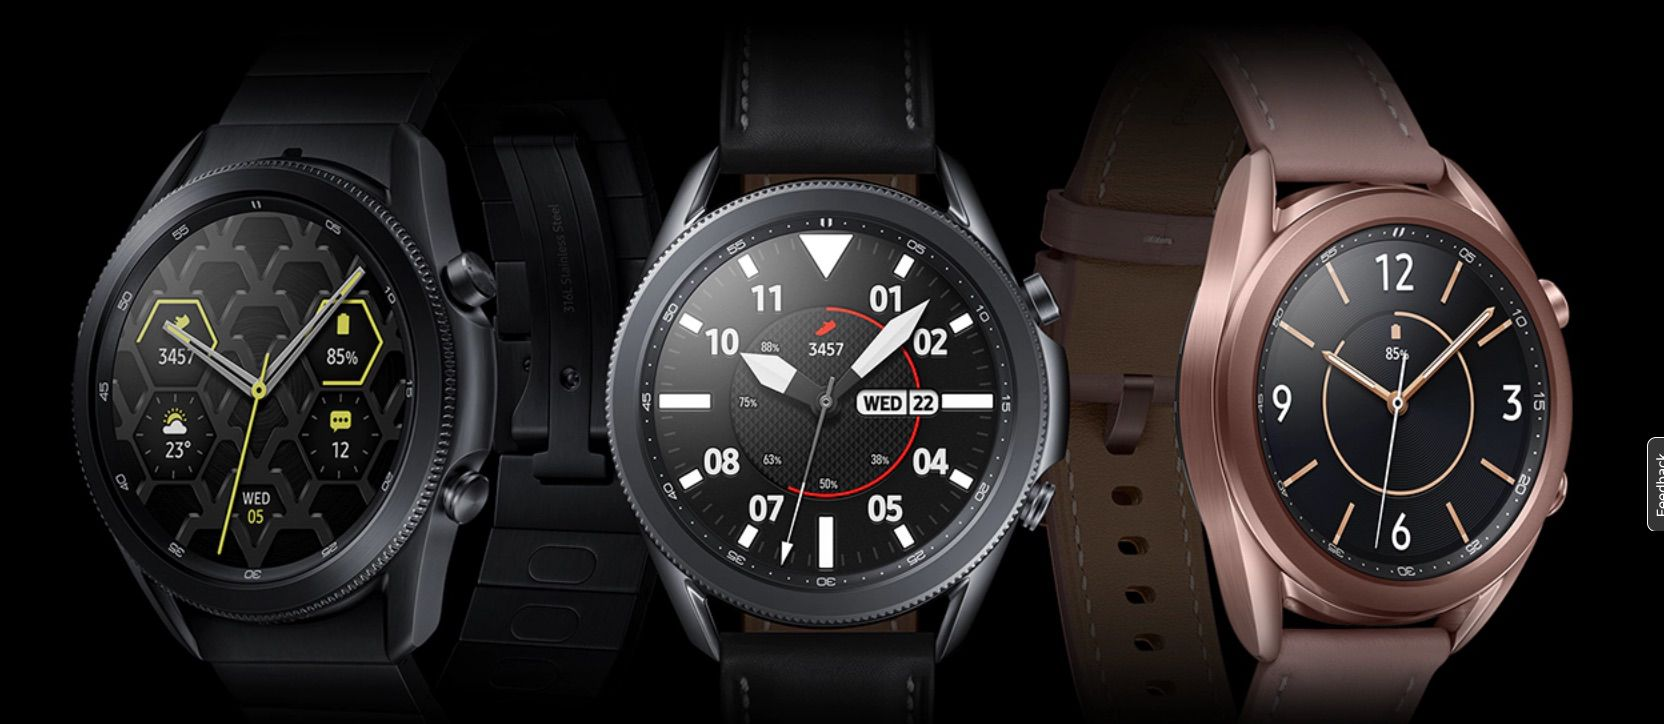 Samsung Galaxy Watch3 smartwatch alternative to Apple Watch